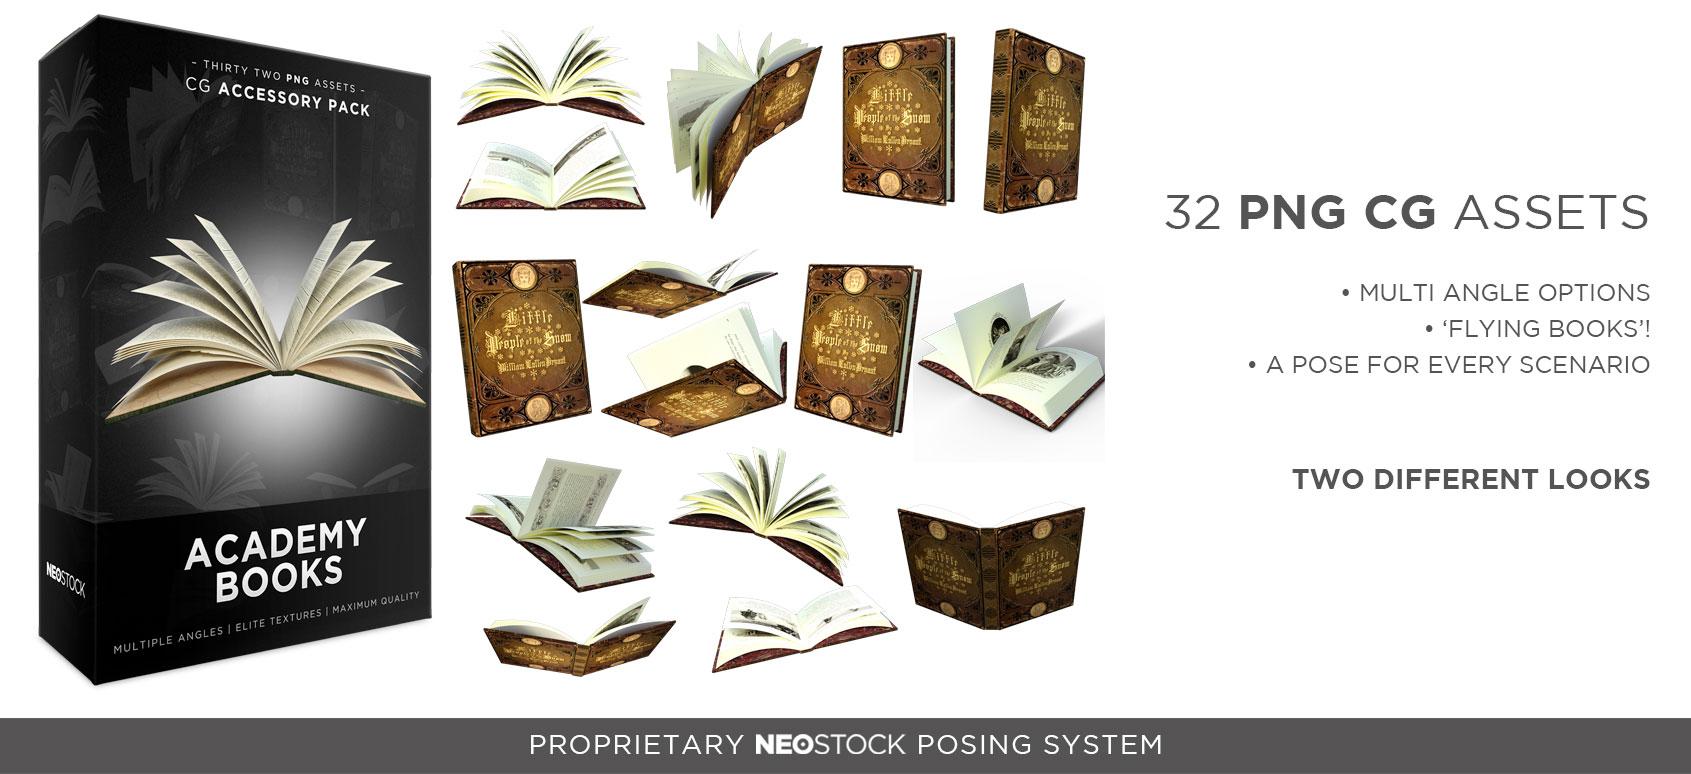 cg academy books product splash